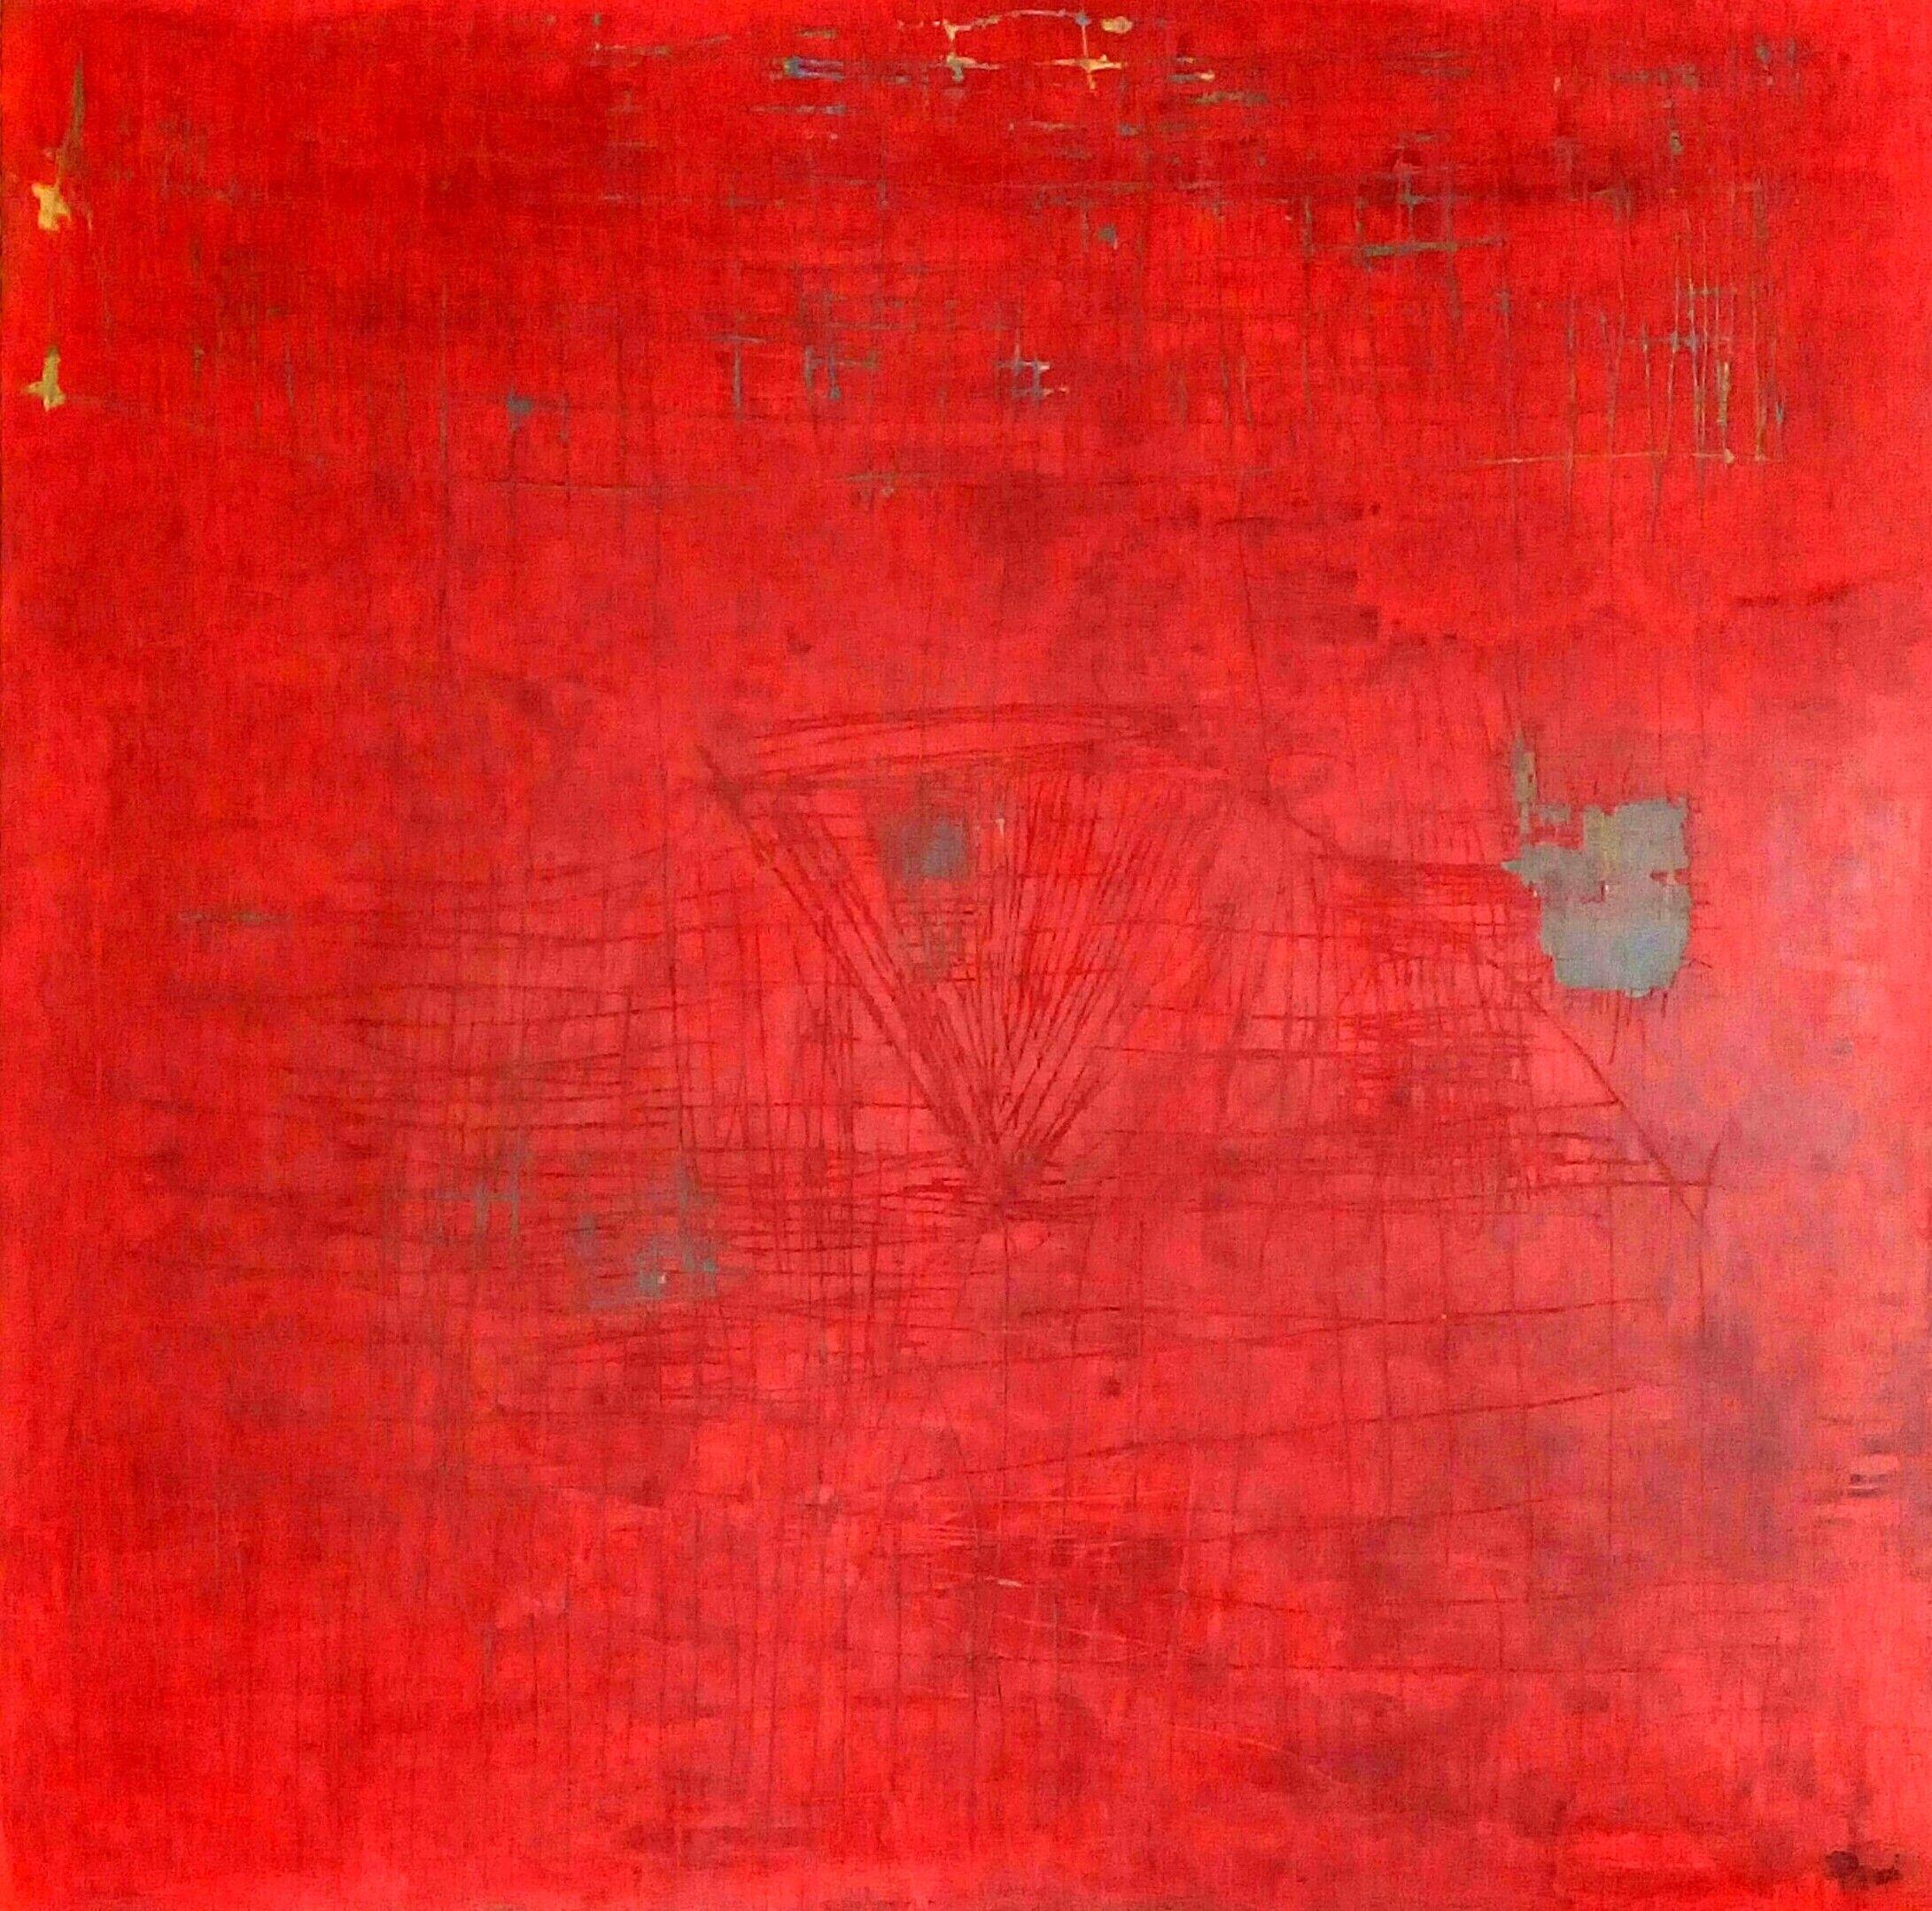 """Caminando sobre rojo"" Mixta Sobre madera 1,22 x 1,22 cm 2015. Vendido"